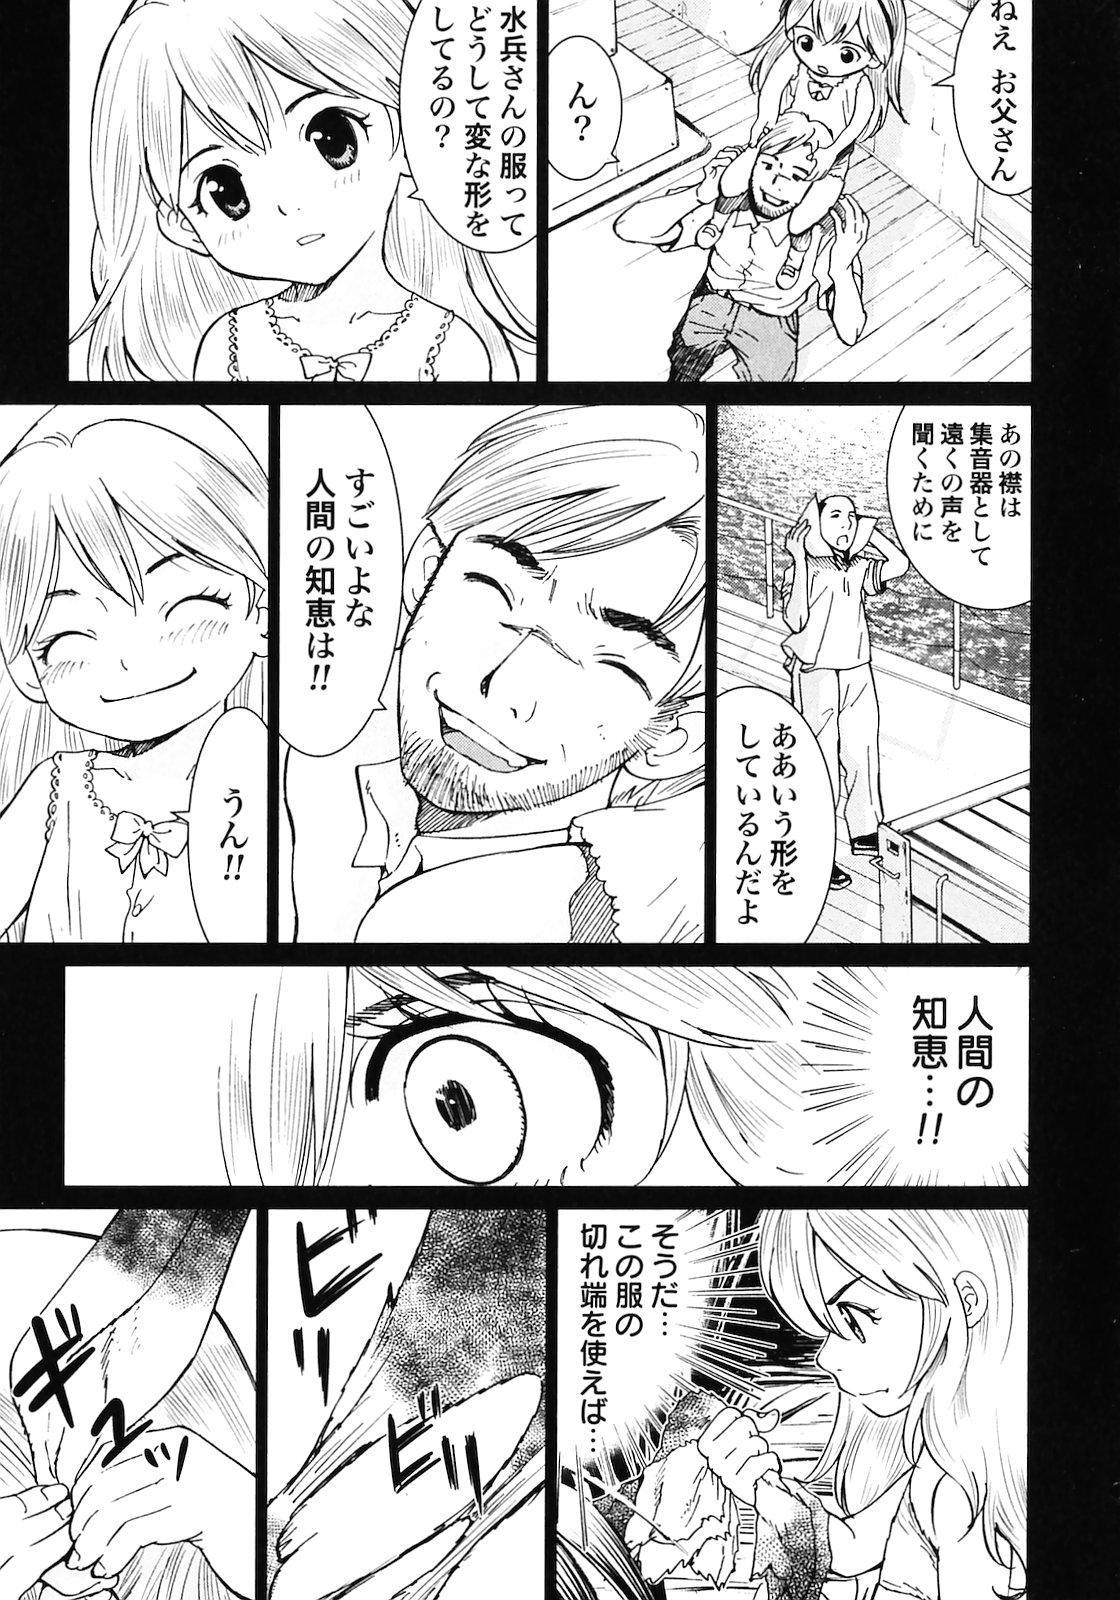 Makyo no Shanana Vol.02 122